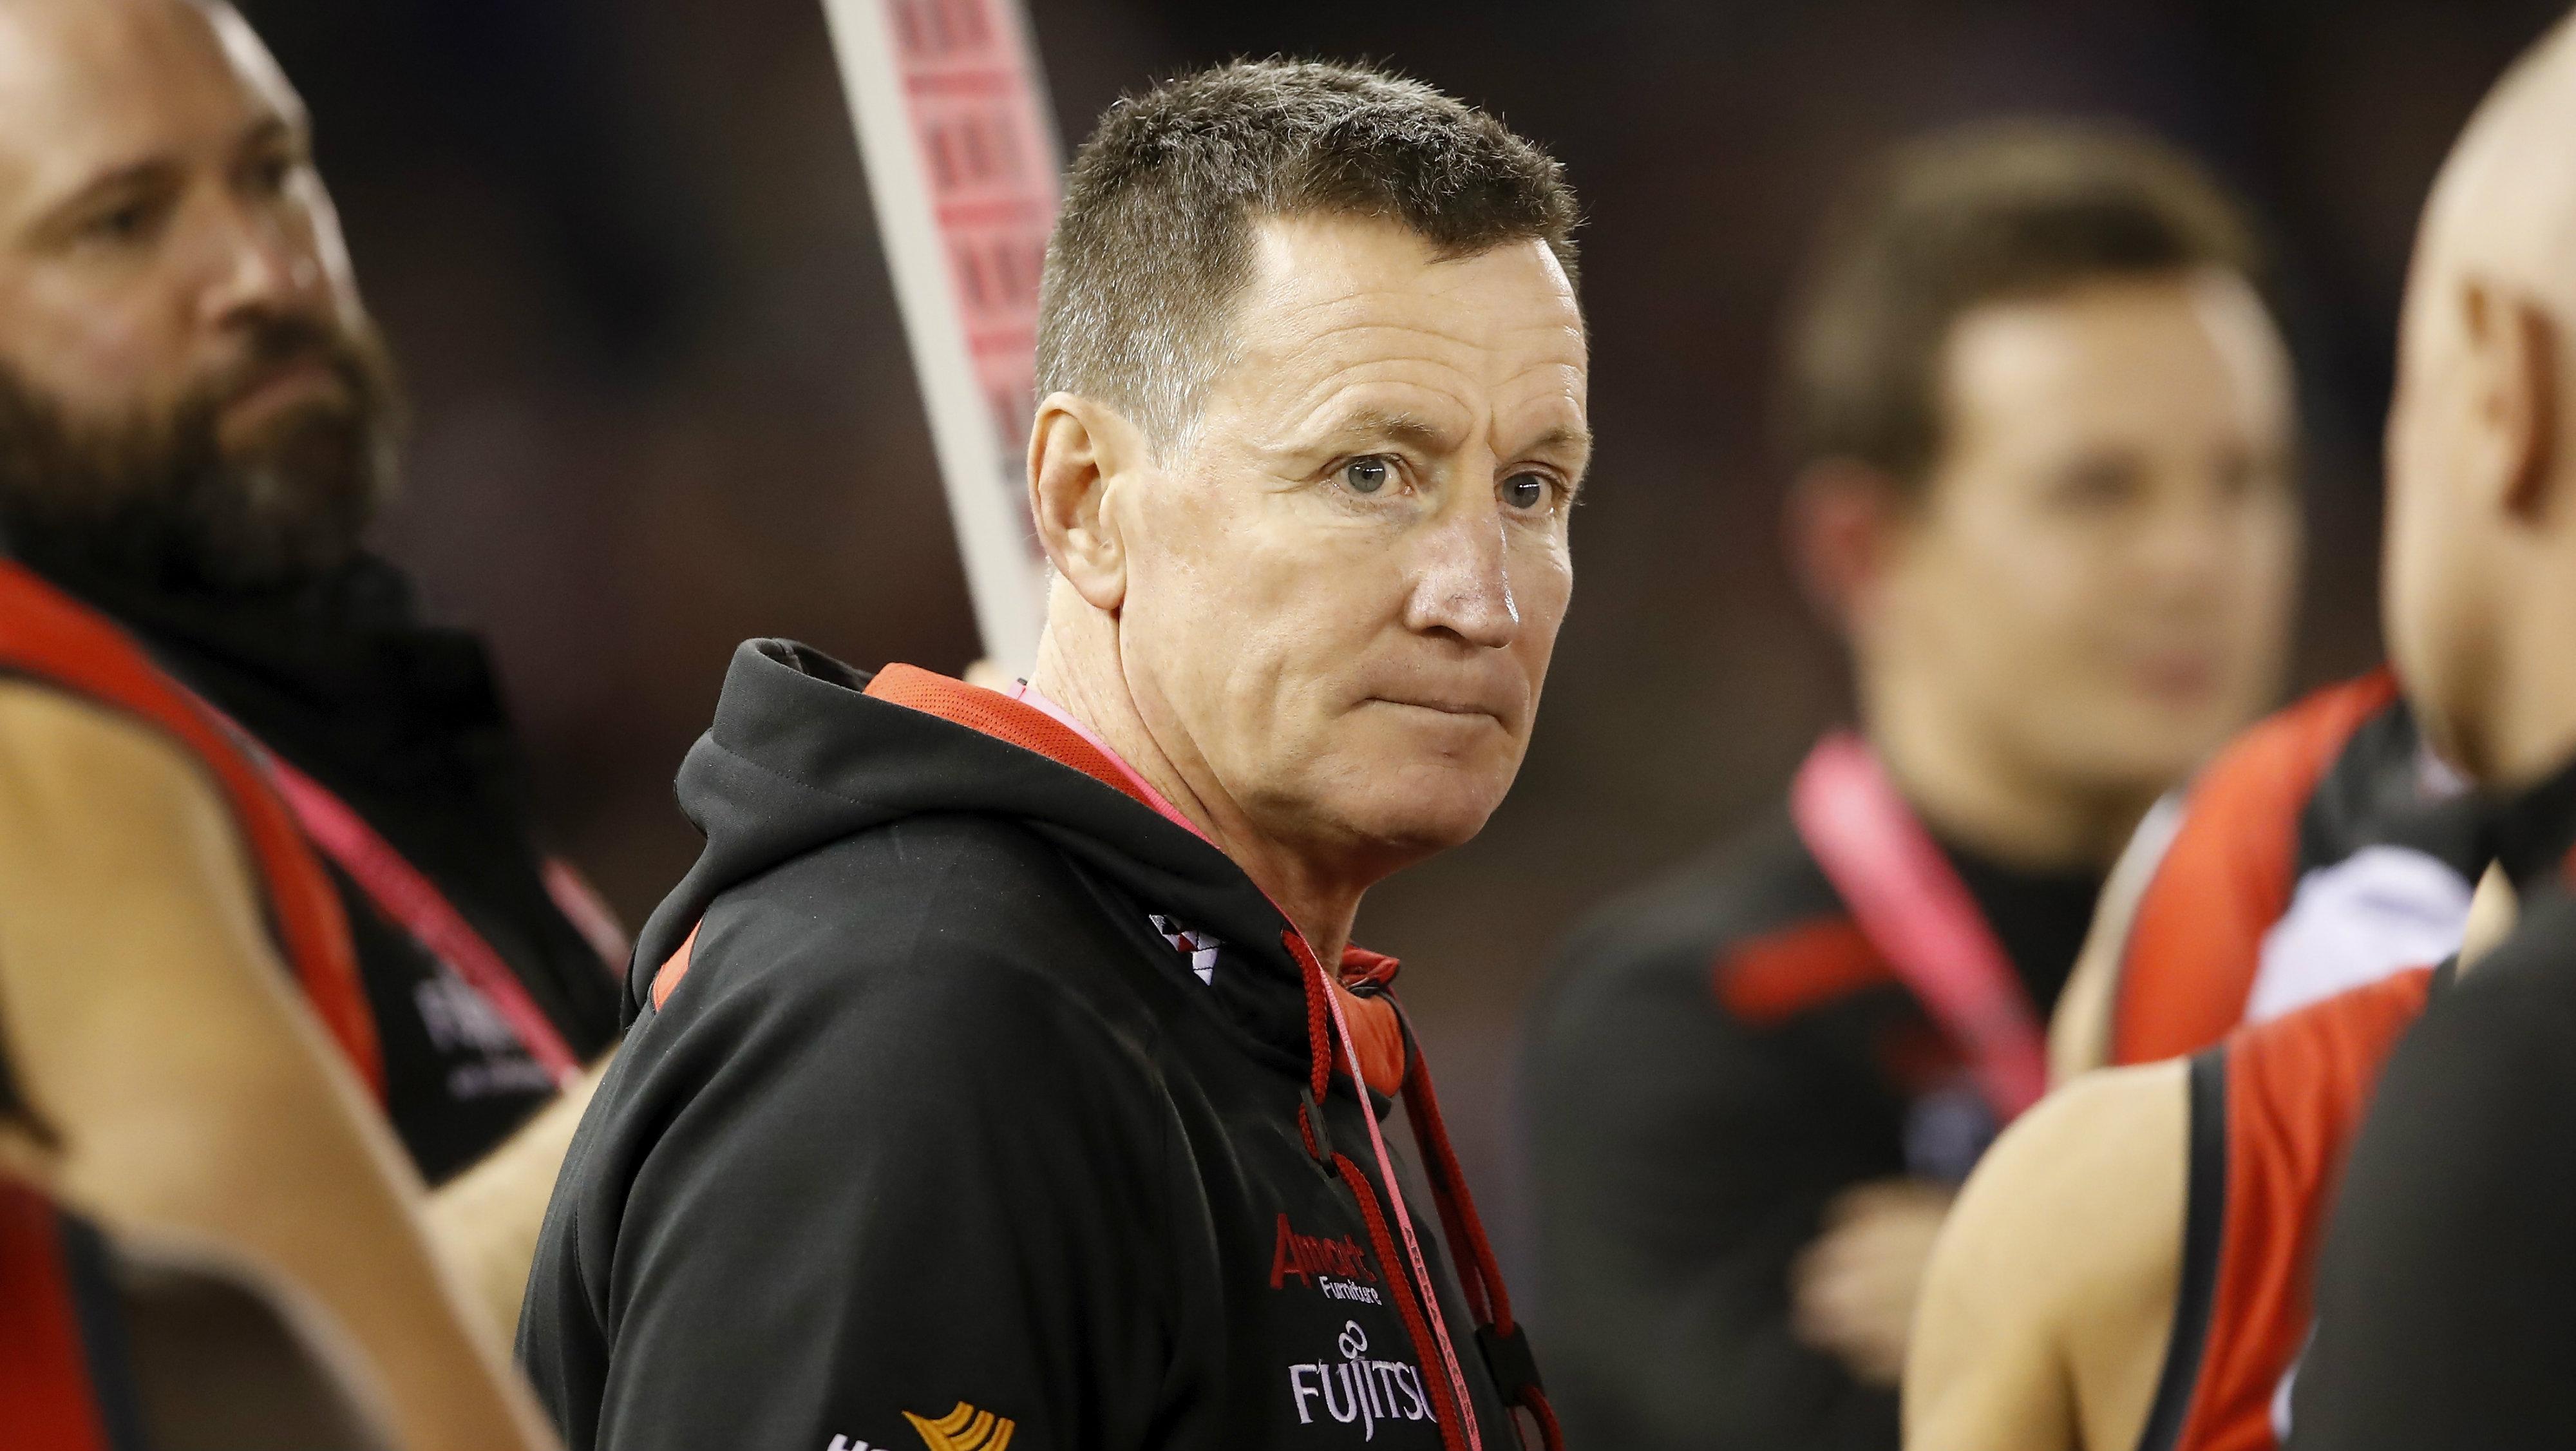 Essendon coach John Worsfold slams critics as 'pretty shallow'